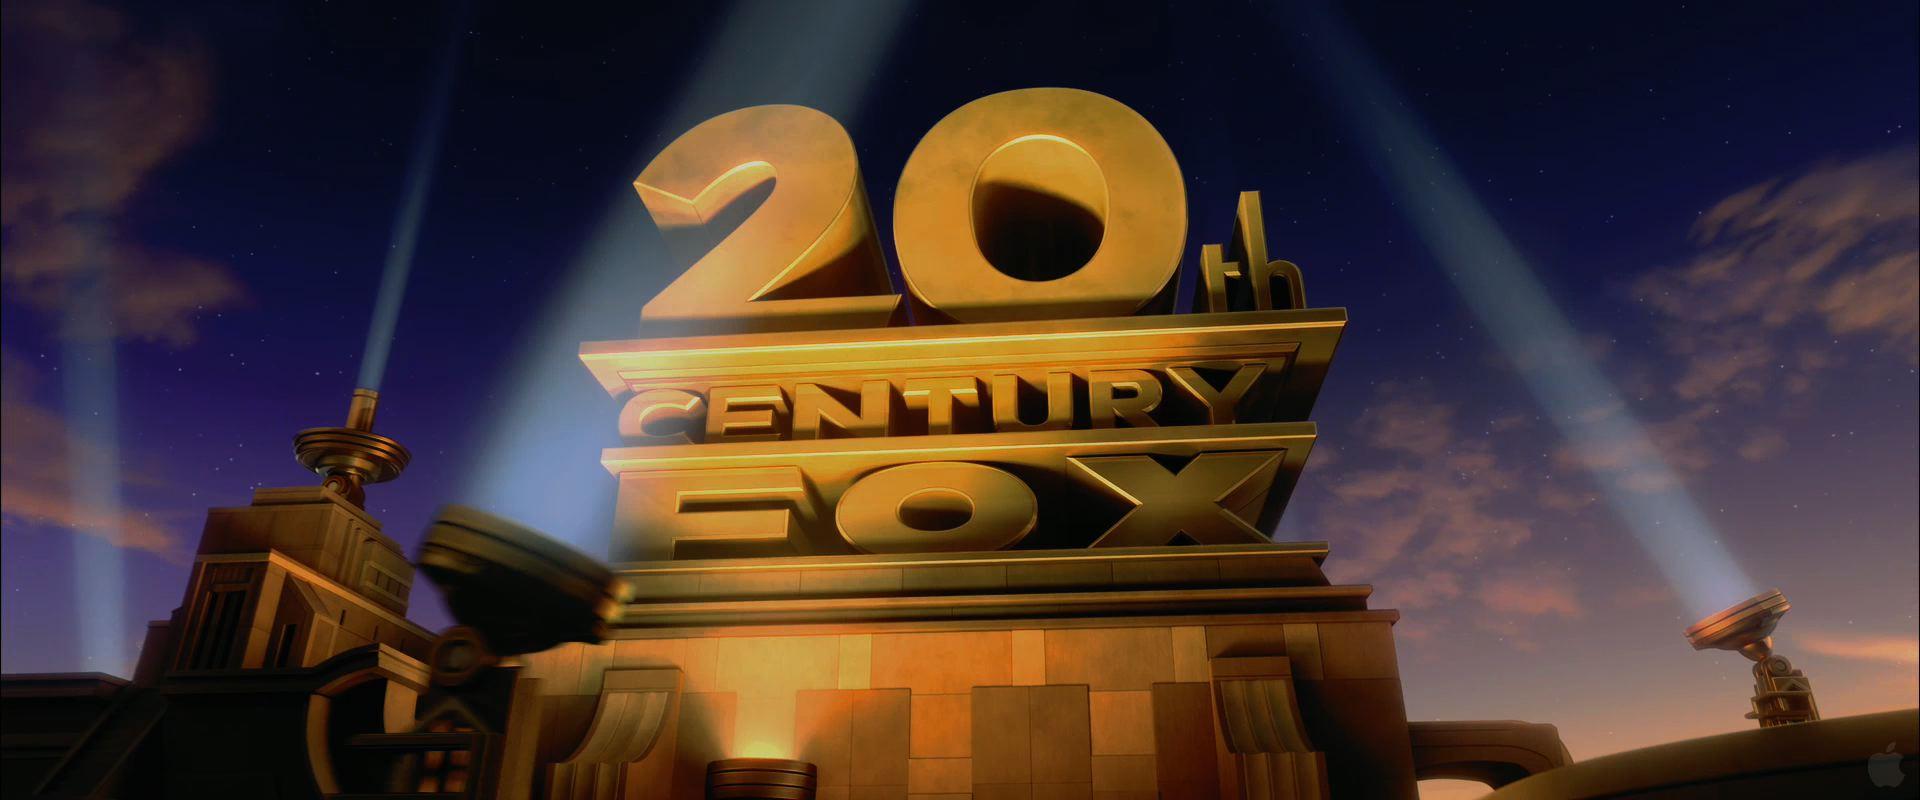 20th Century Fox Movie Studios Logo Desktop Wallpaper 1920x800